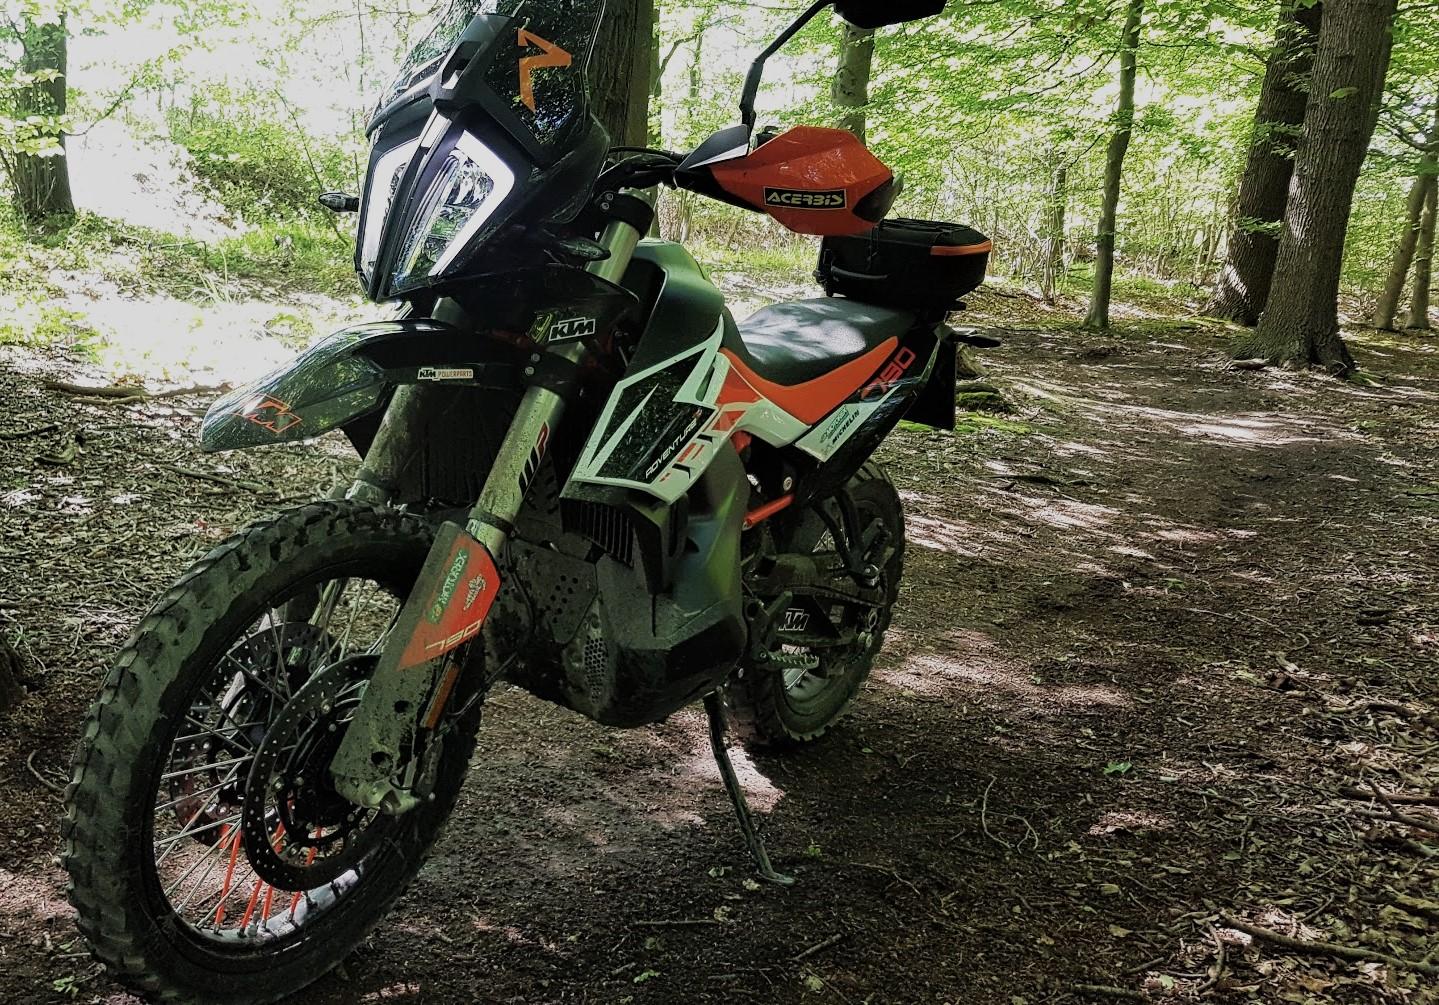 790R-dirty_woods.jpg